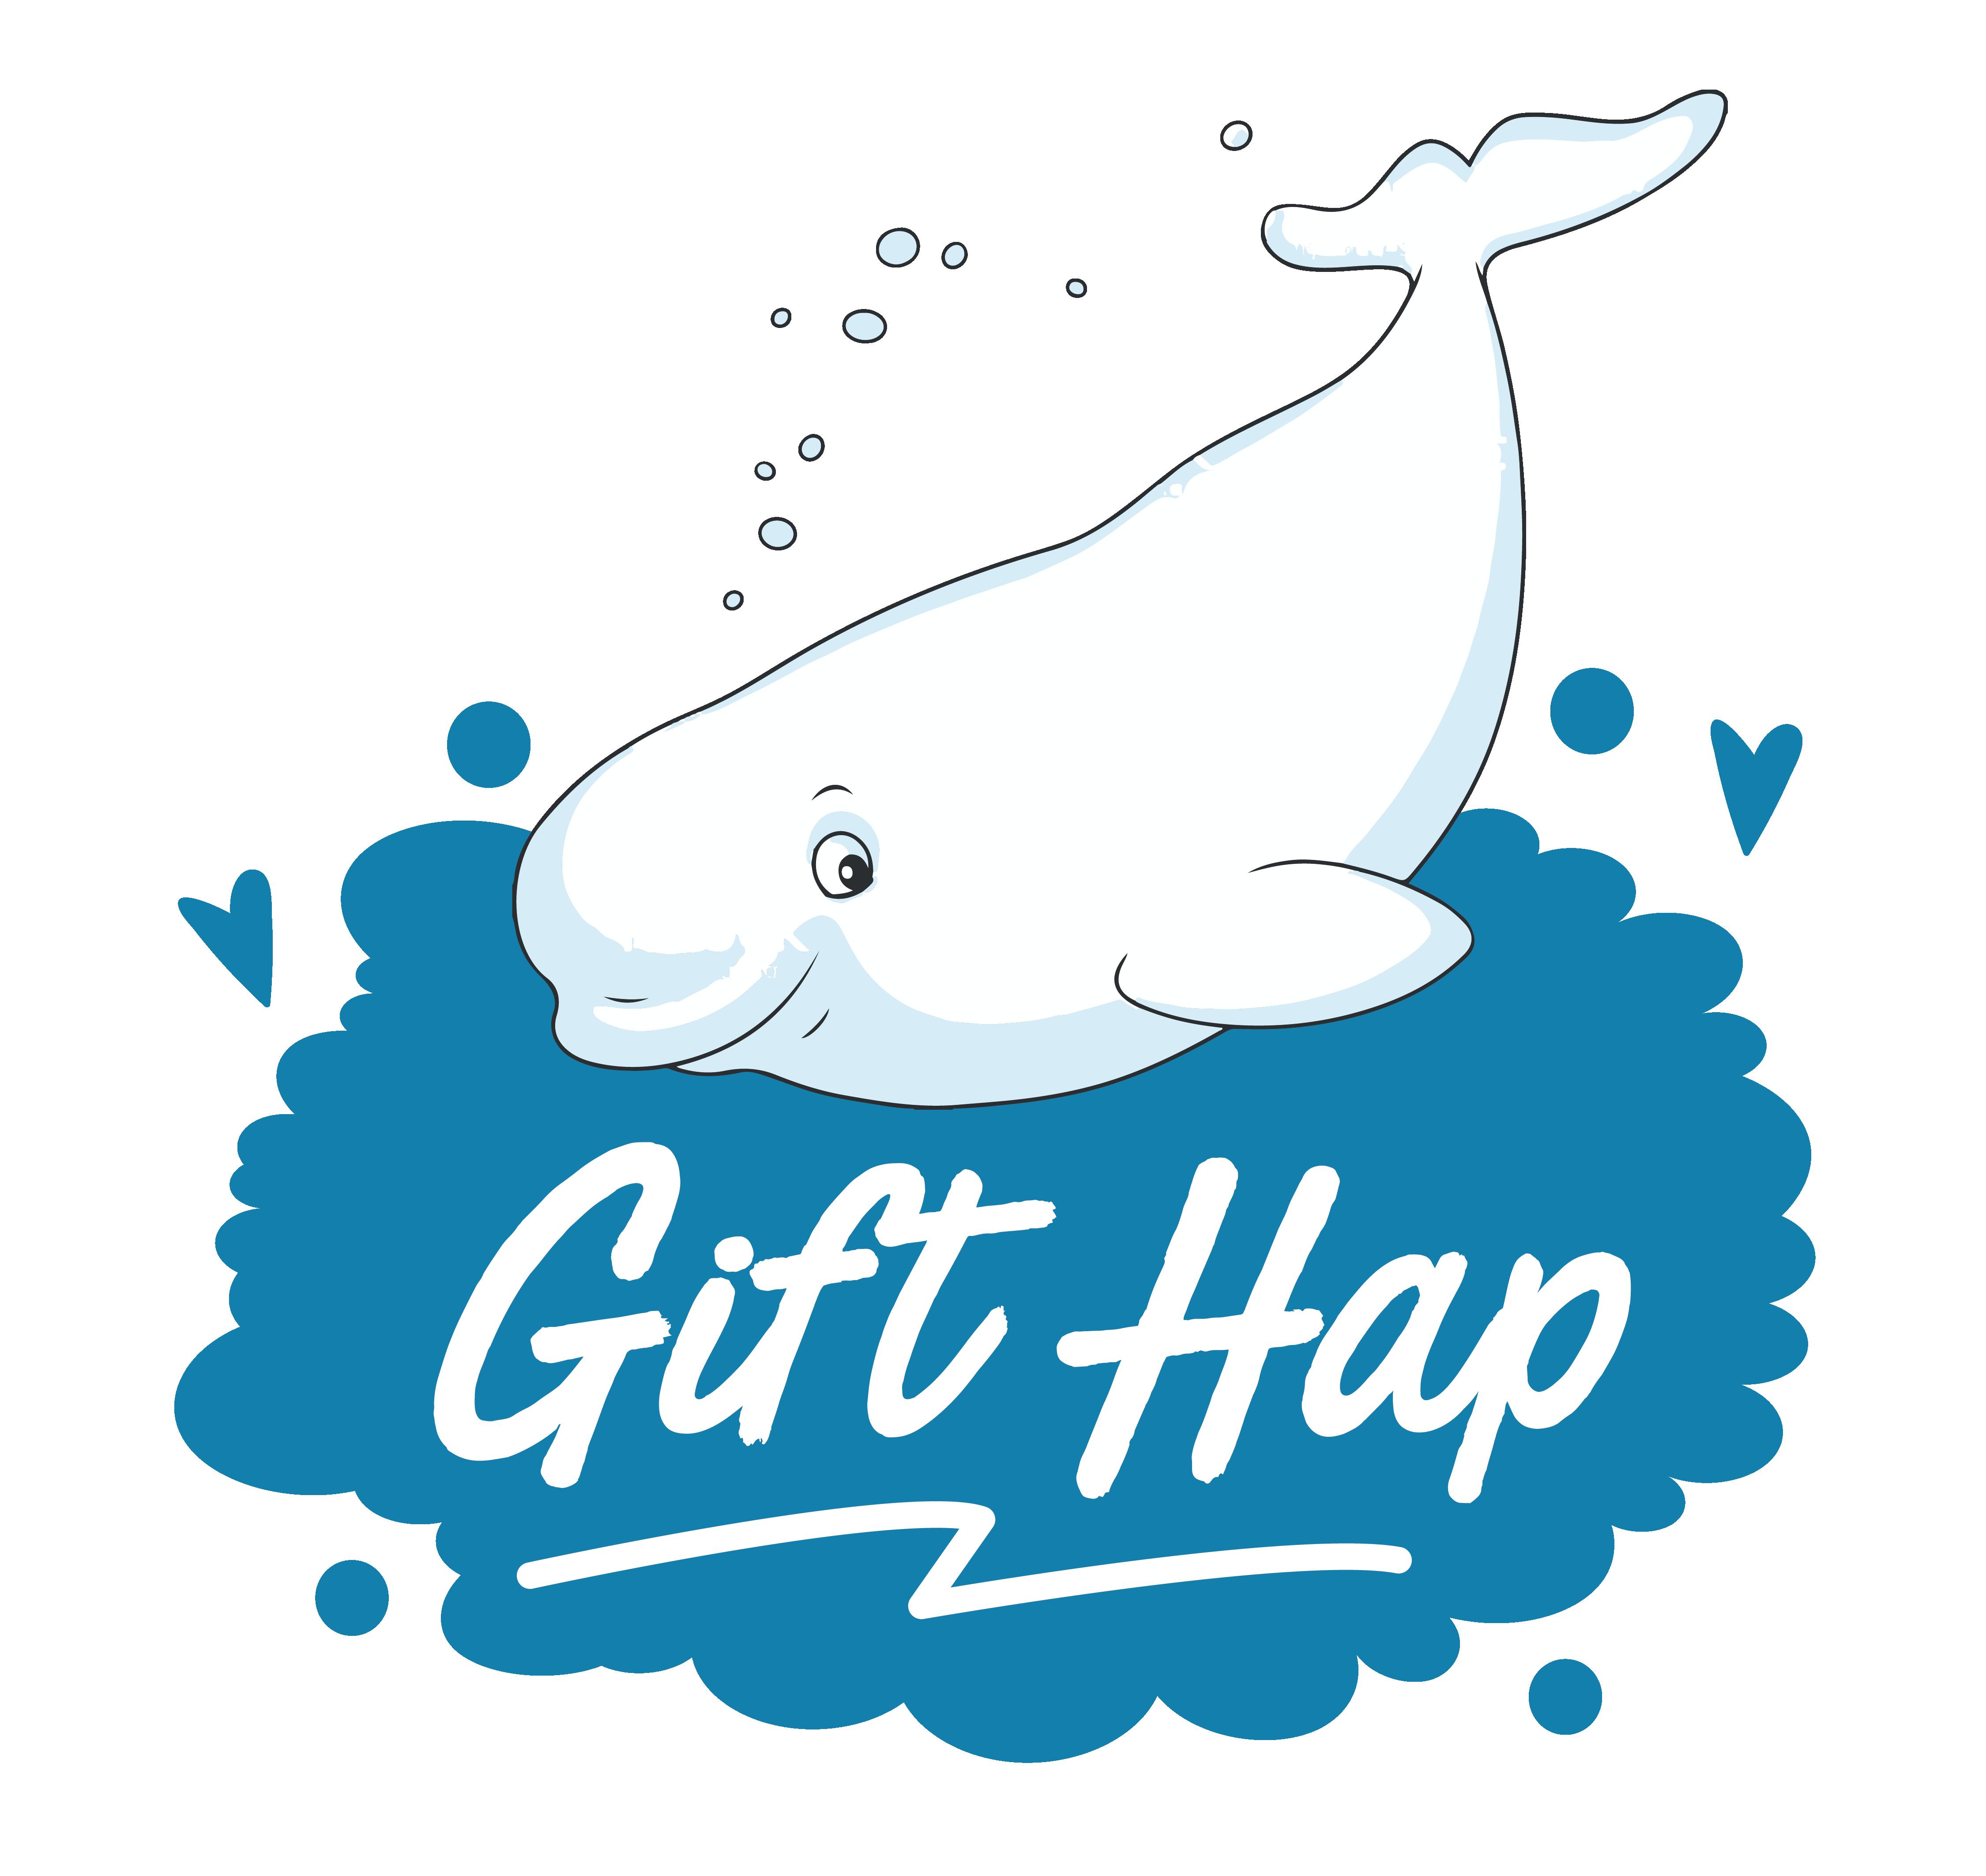 Messy Bun Beanie Gifthap Gifts Cartoon Cat Crafts